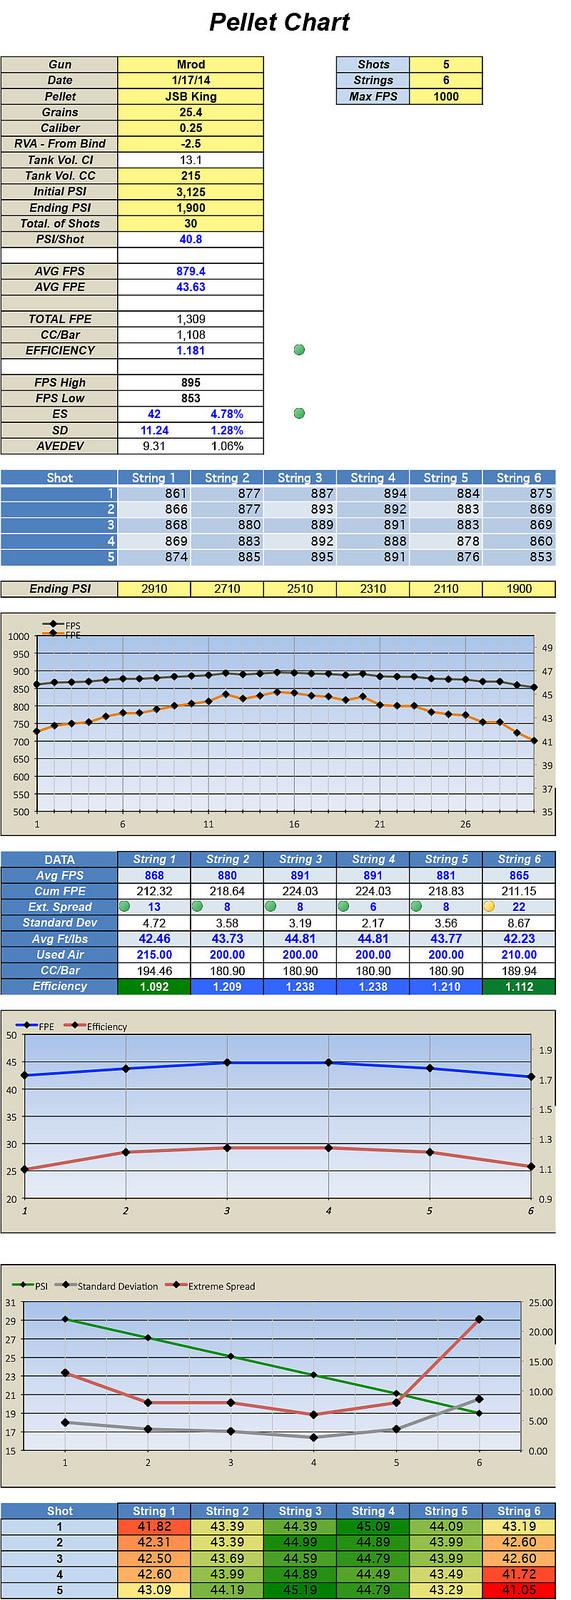 Pcp Excel Spreadsheet Intended For Shot String Spreadsheets W/graphs  Airguns  Guns Forum